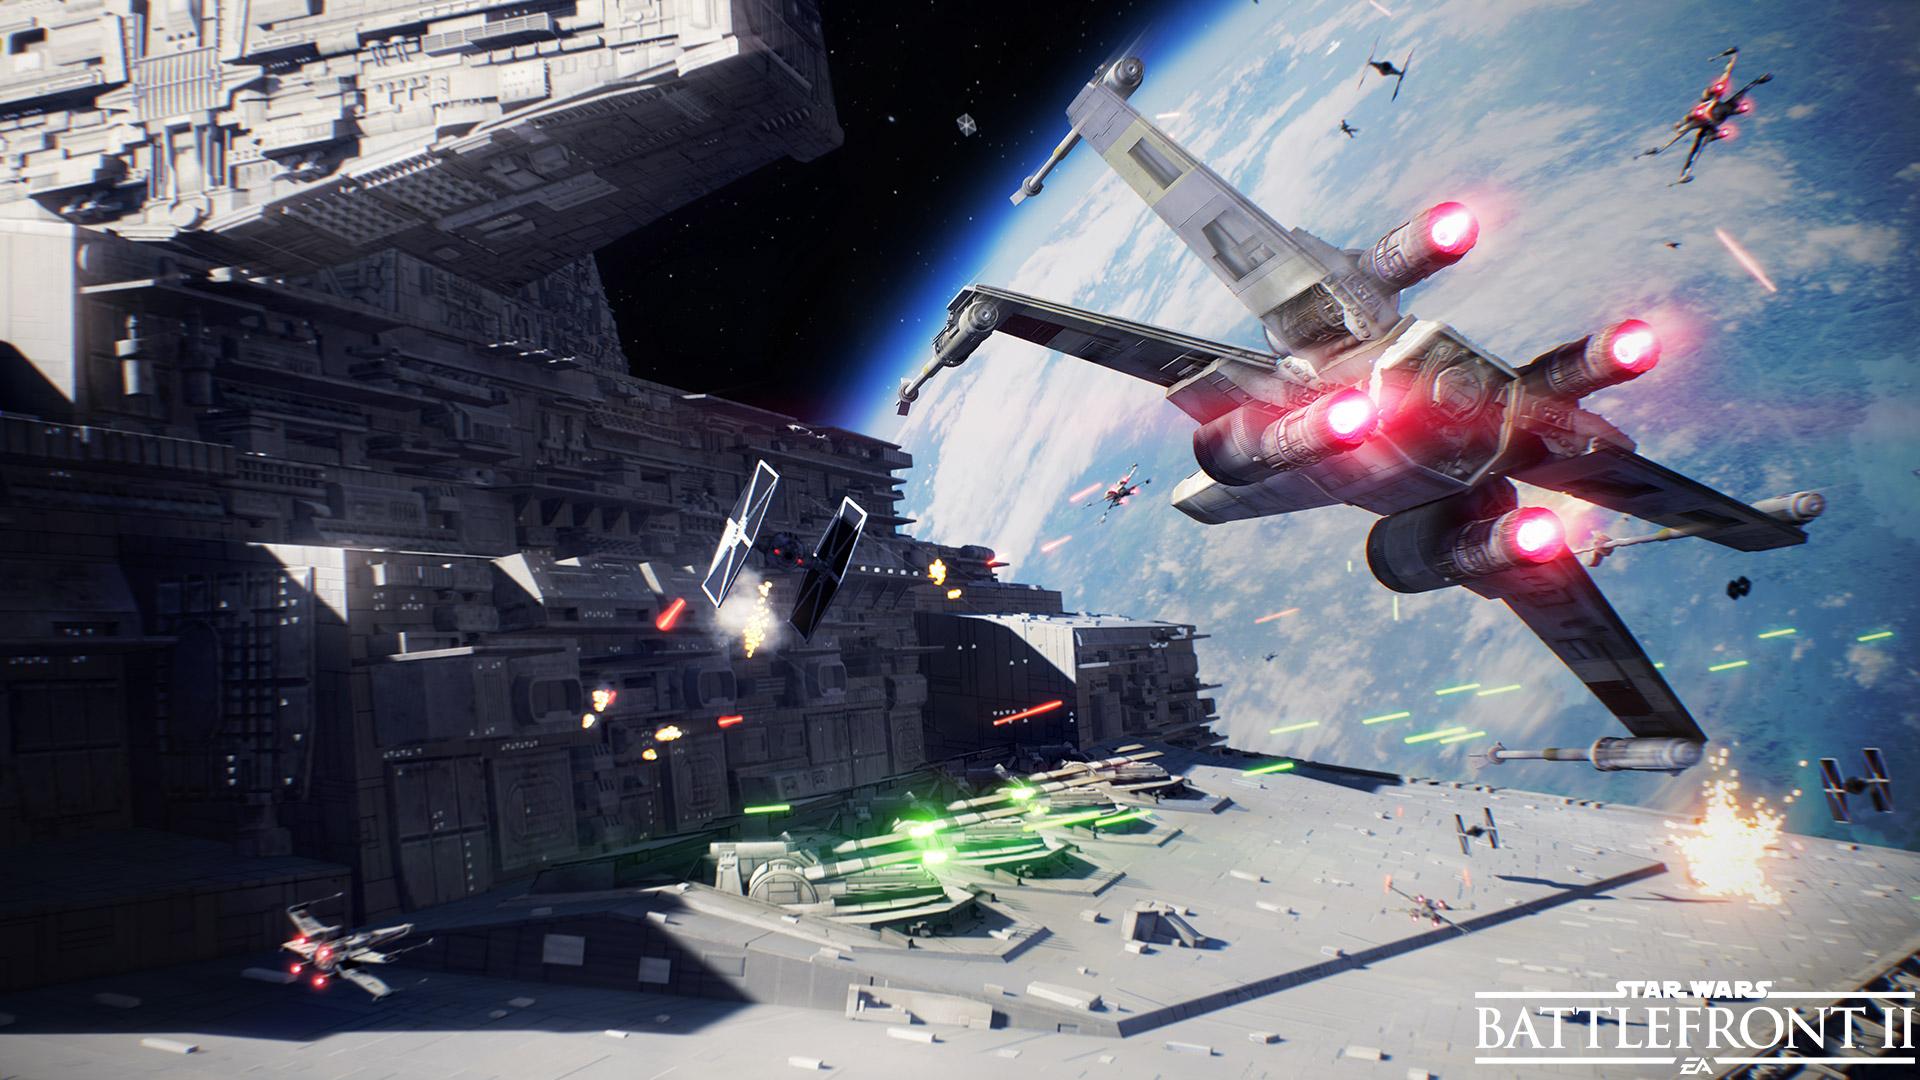 star wars battlefront ii 2017 3, hd games, 4k wallpapers, images